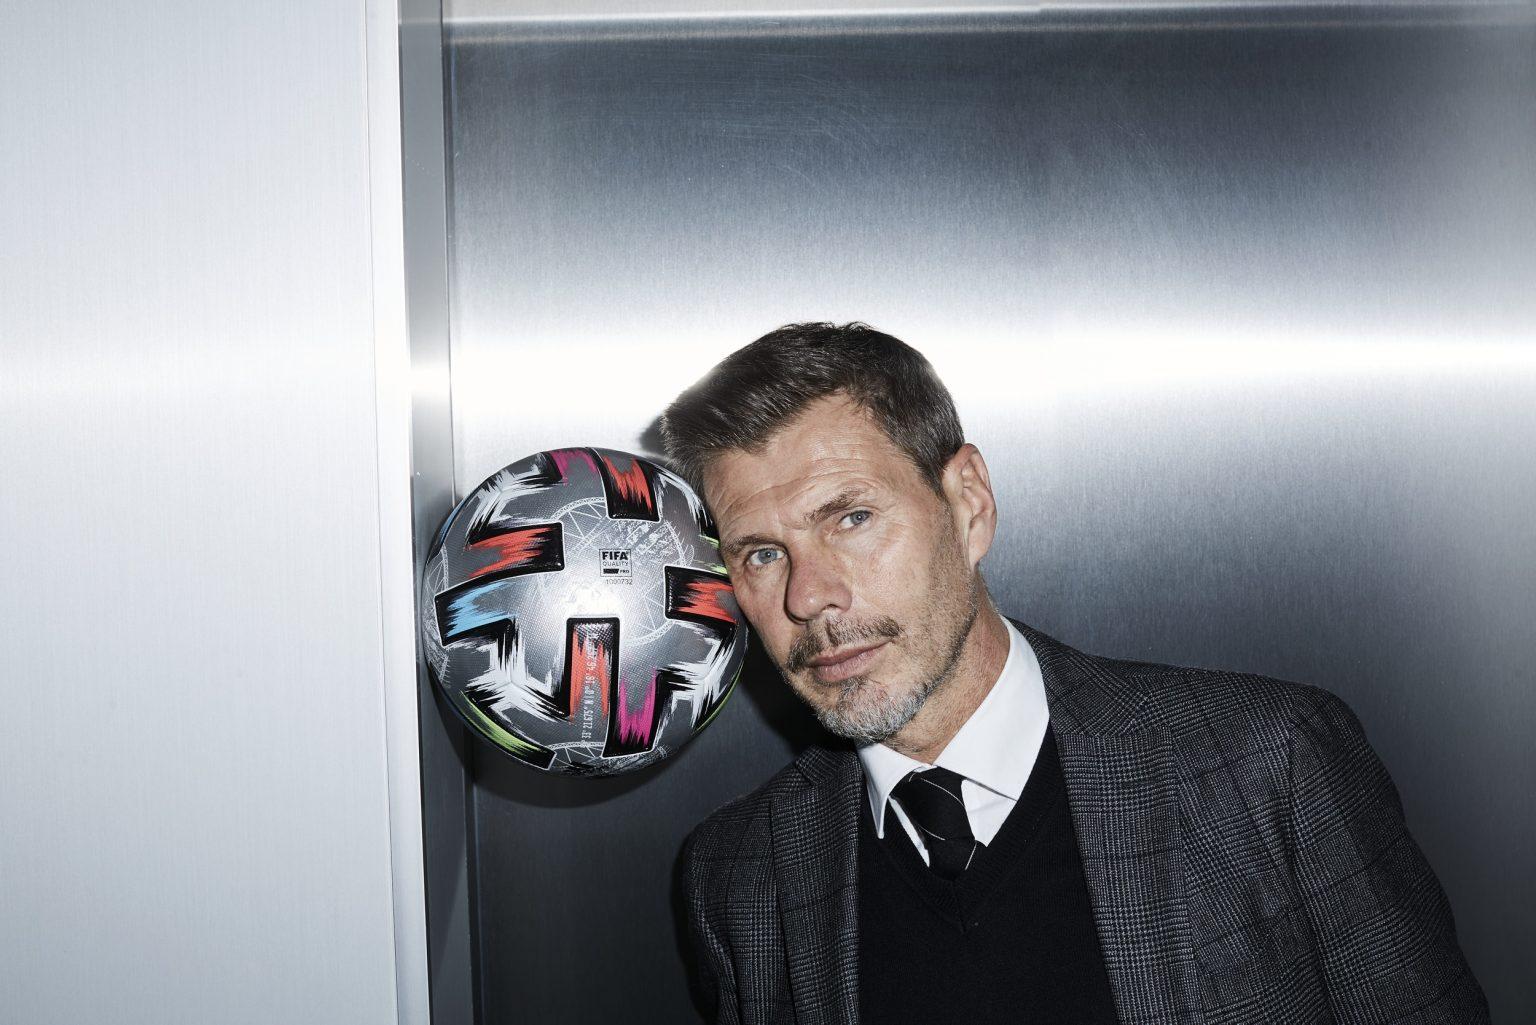 Zvonimir Boban, footballer, calciatore, Croazia, Croatia, Milan, UEFA, manager, dirigente, genio del calcio, football genius, Nyon, Switzerland, Svizzera